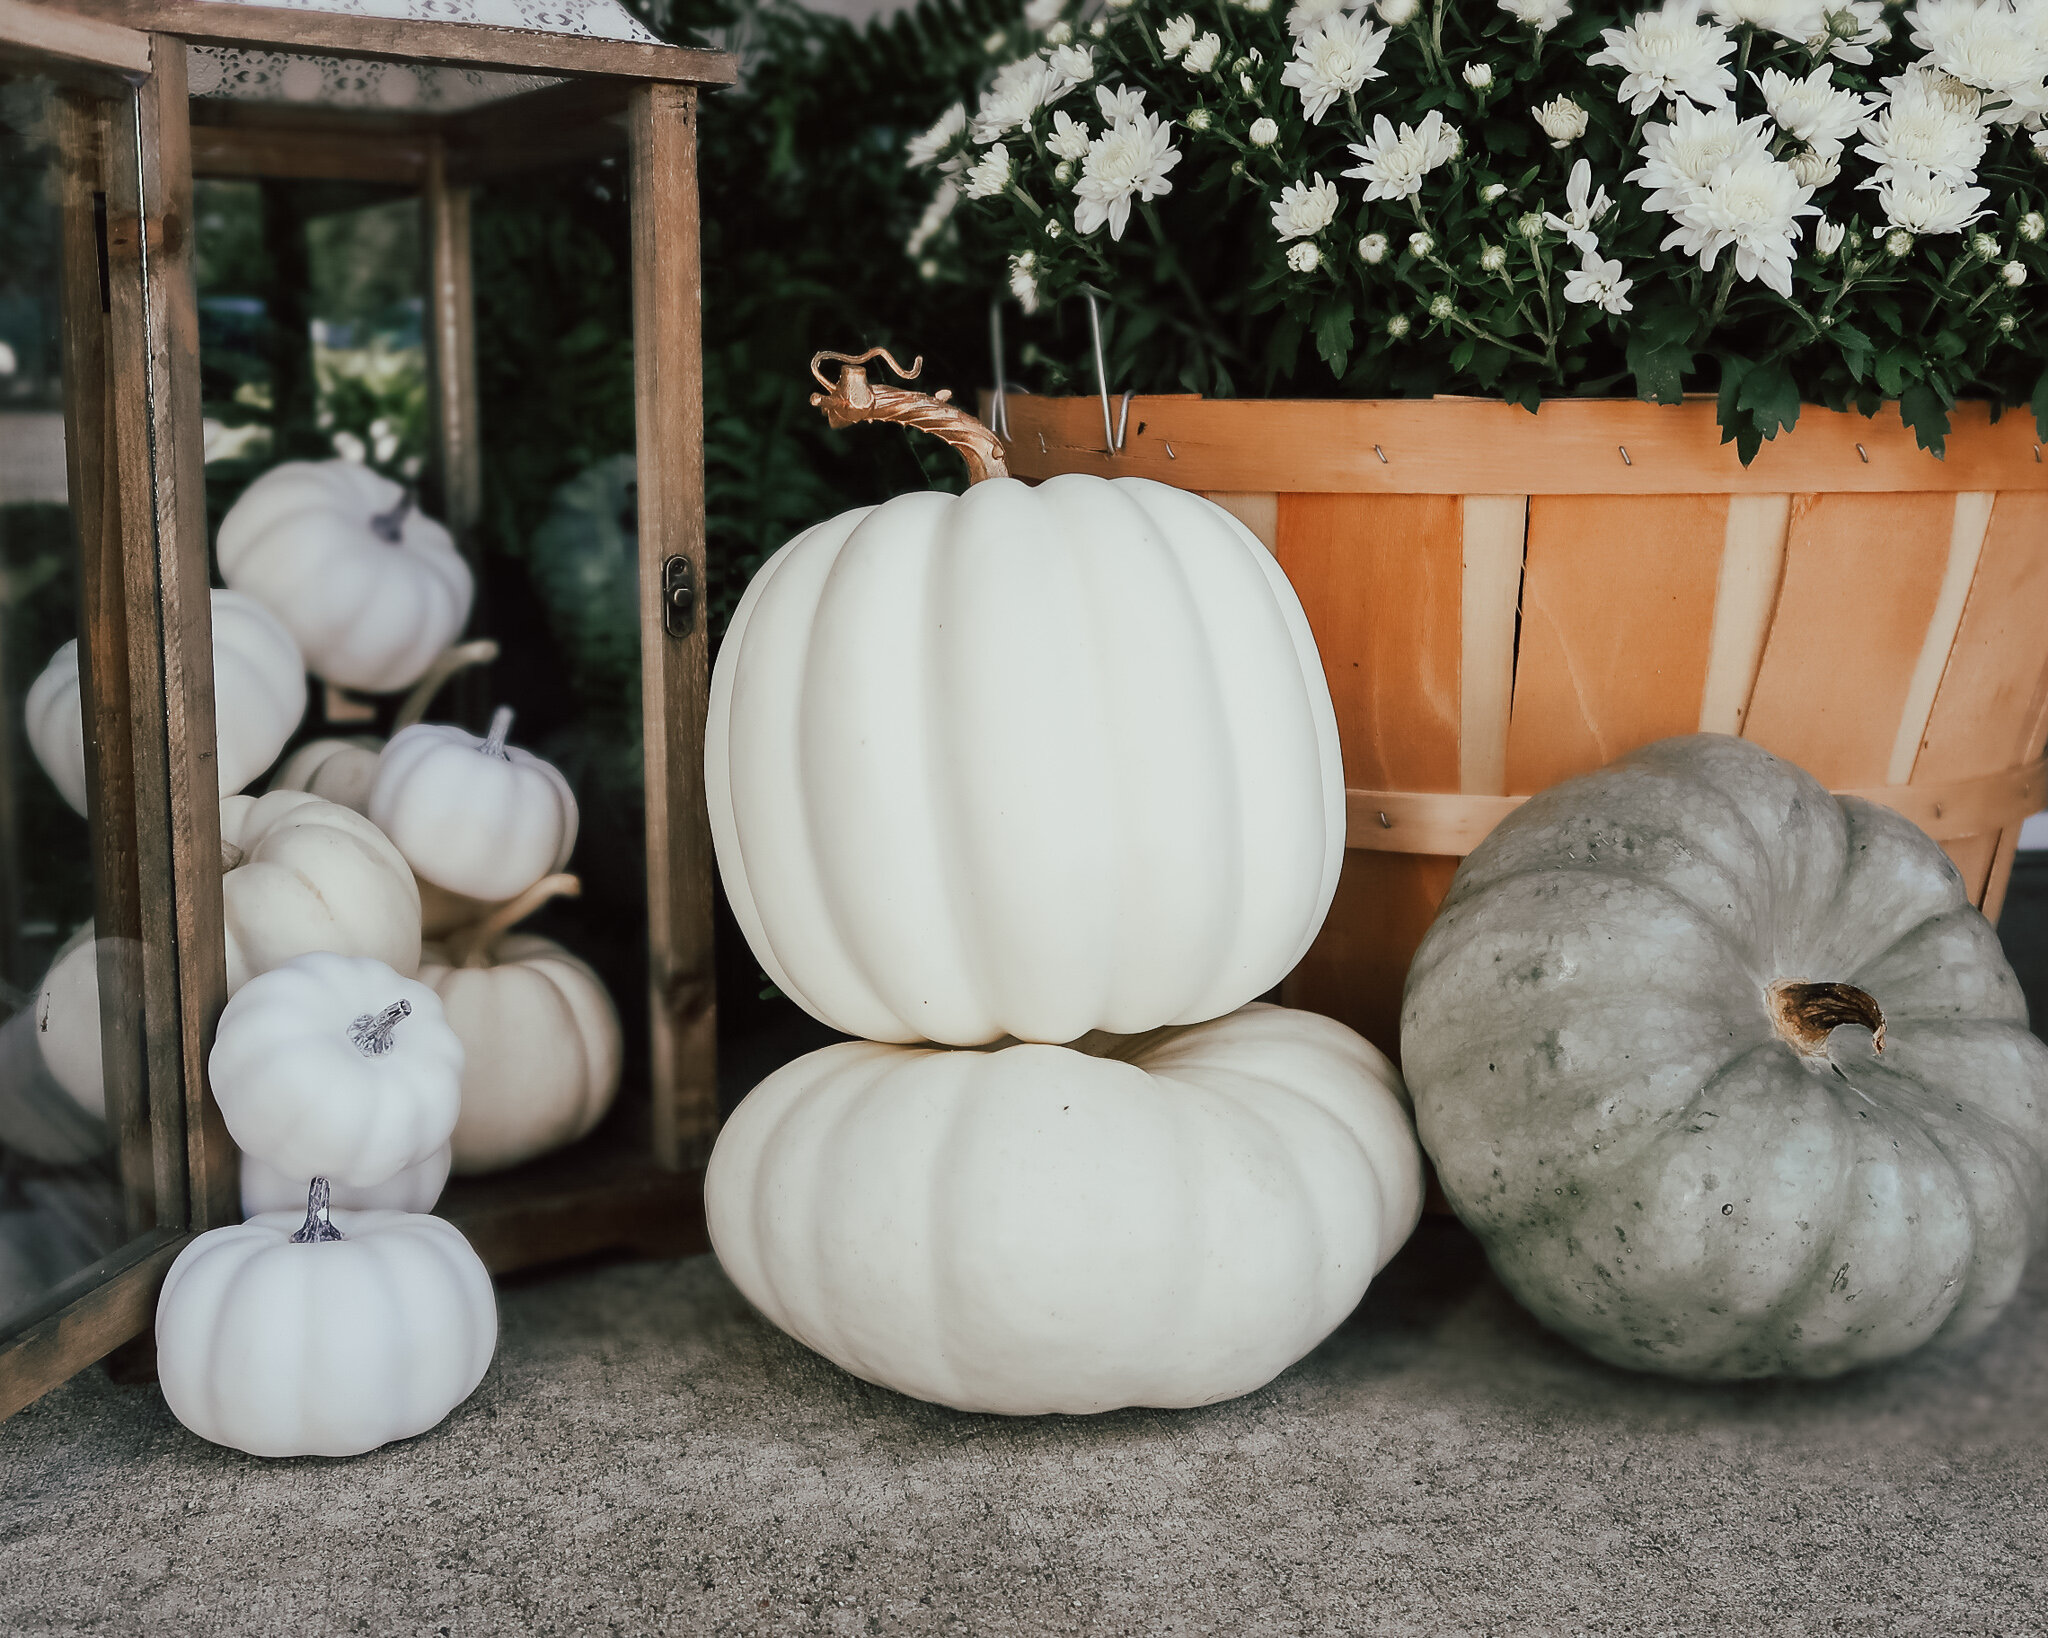 fall-front-porch-decor-10.jpg